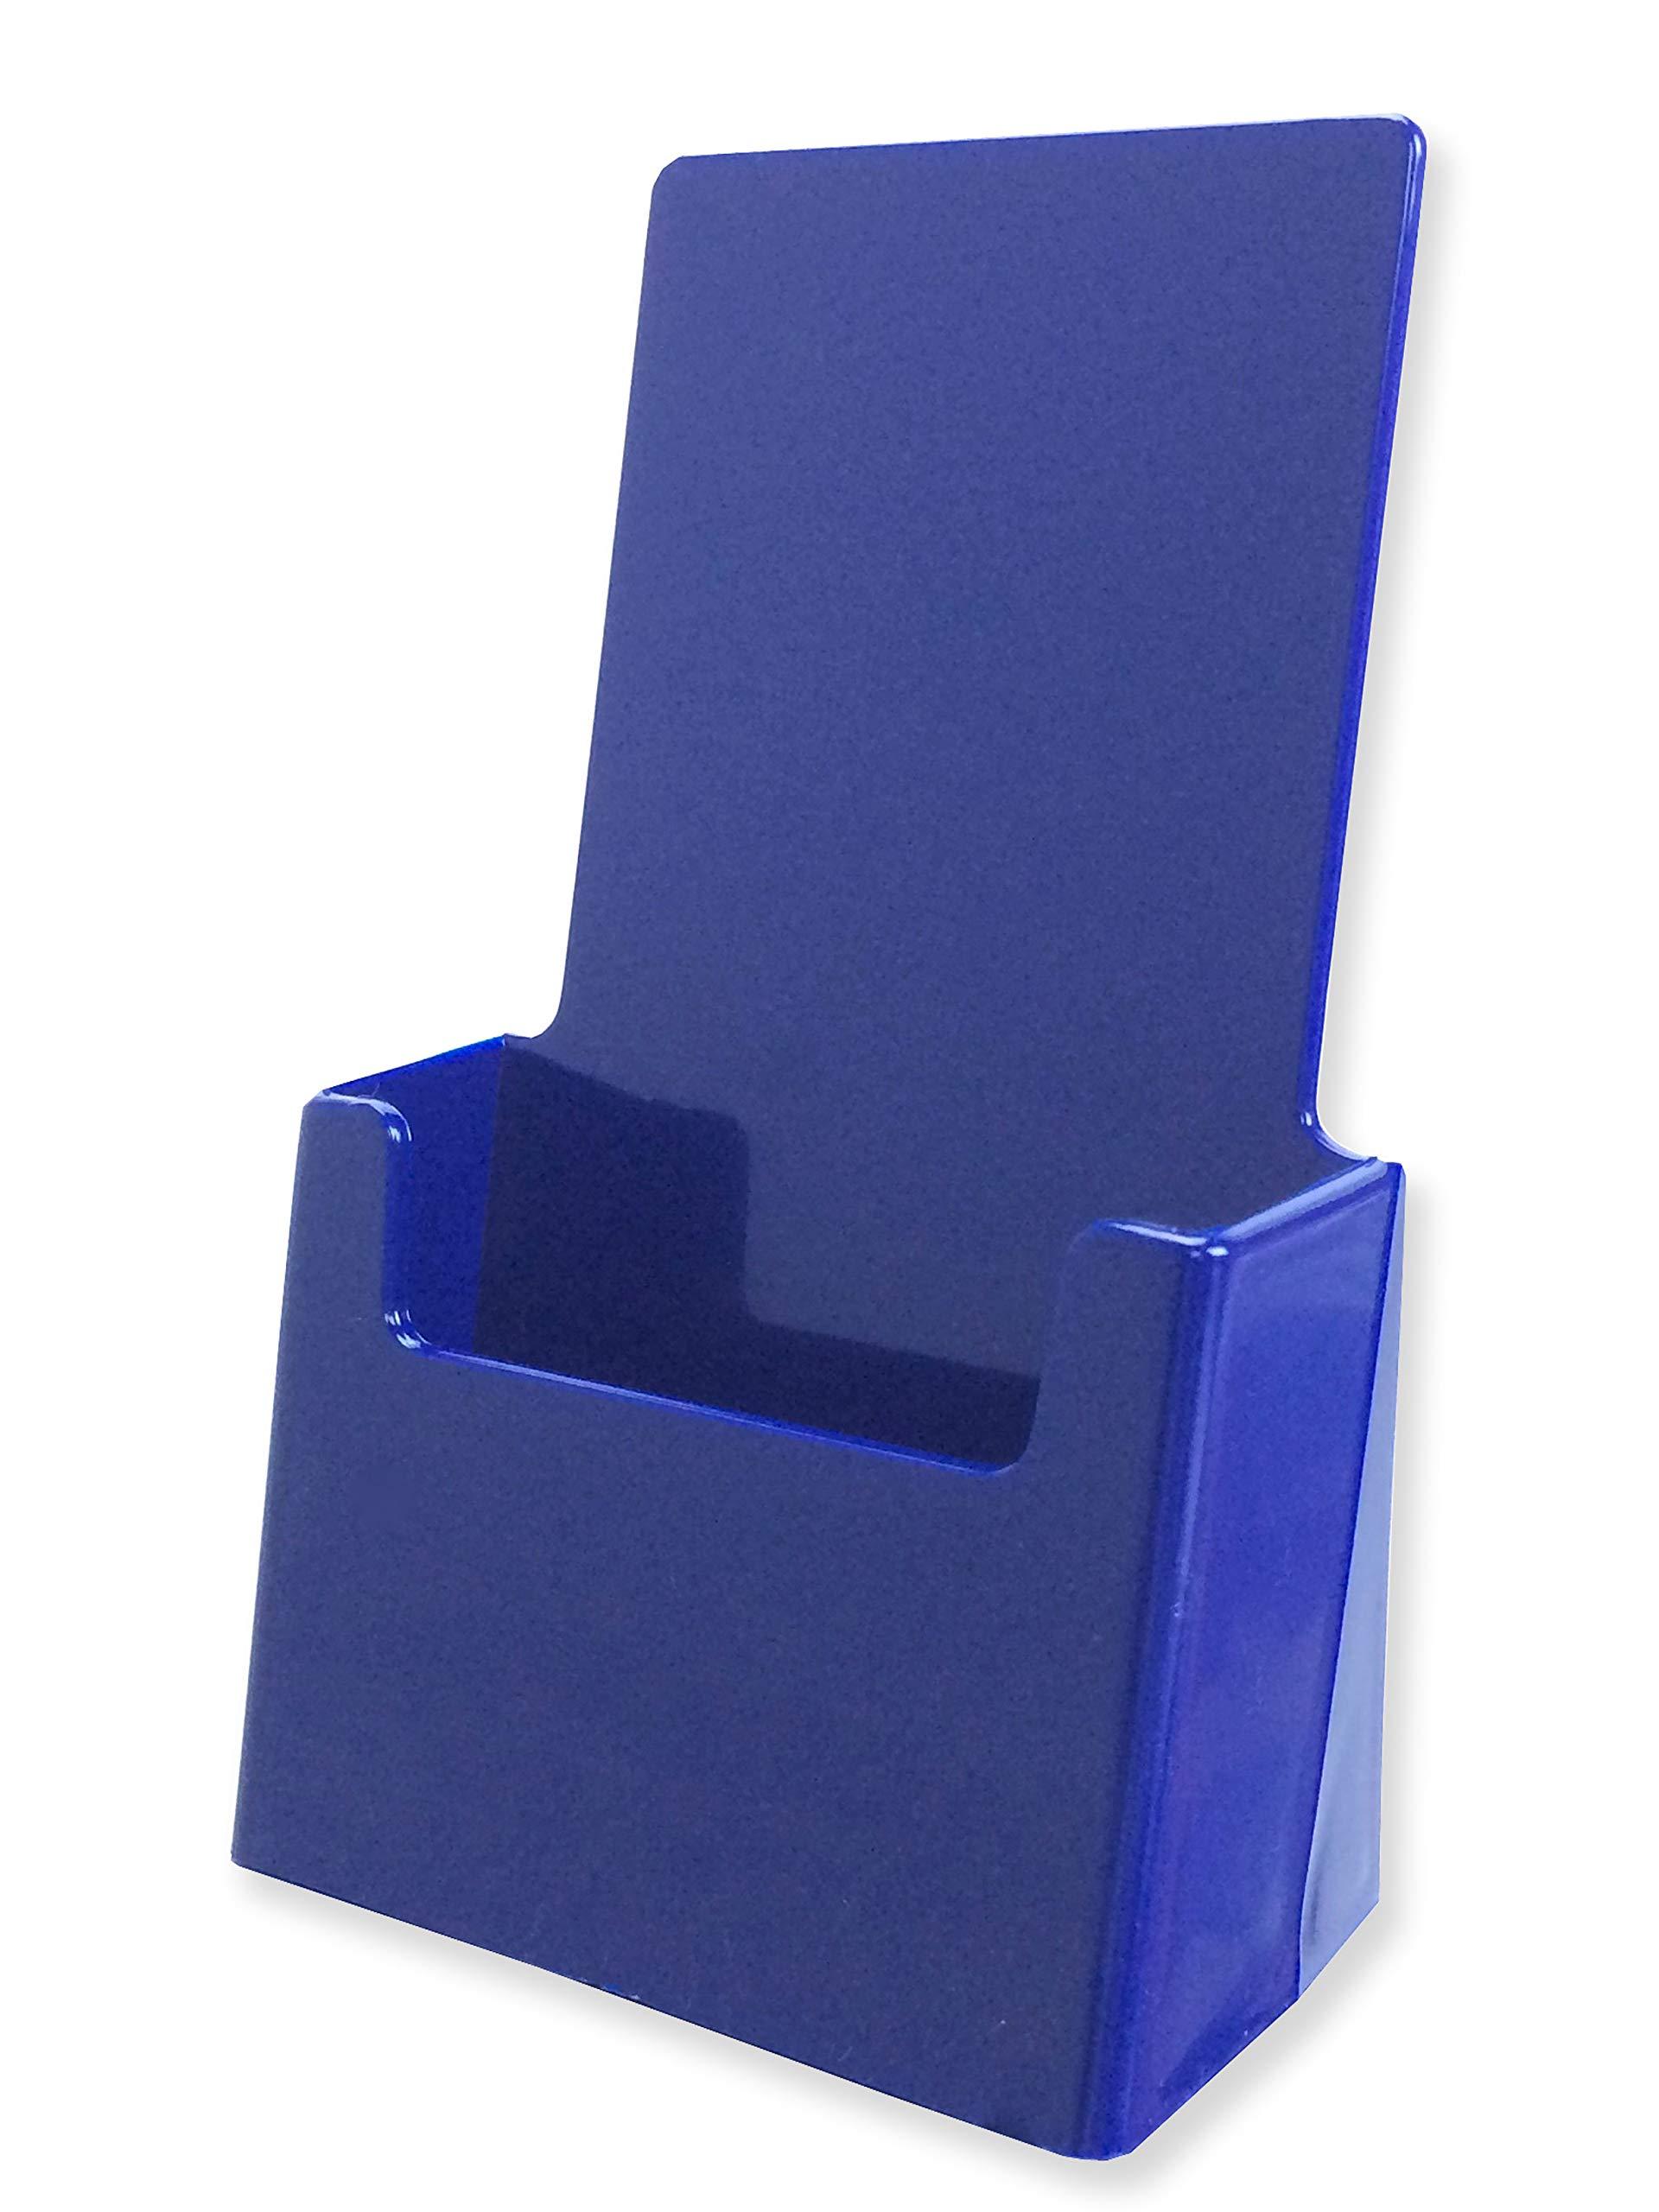 Marketing Holders Blue Brochure Pamphlet Holder Advertisement Literature Display Printed Material Paper Rack Countertop 4''w x 7''h Pack of 10